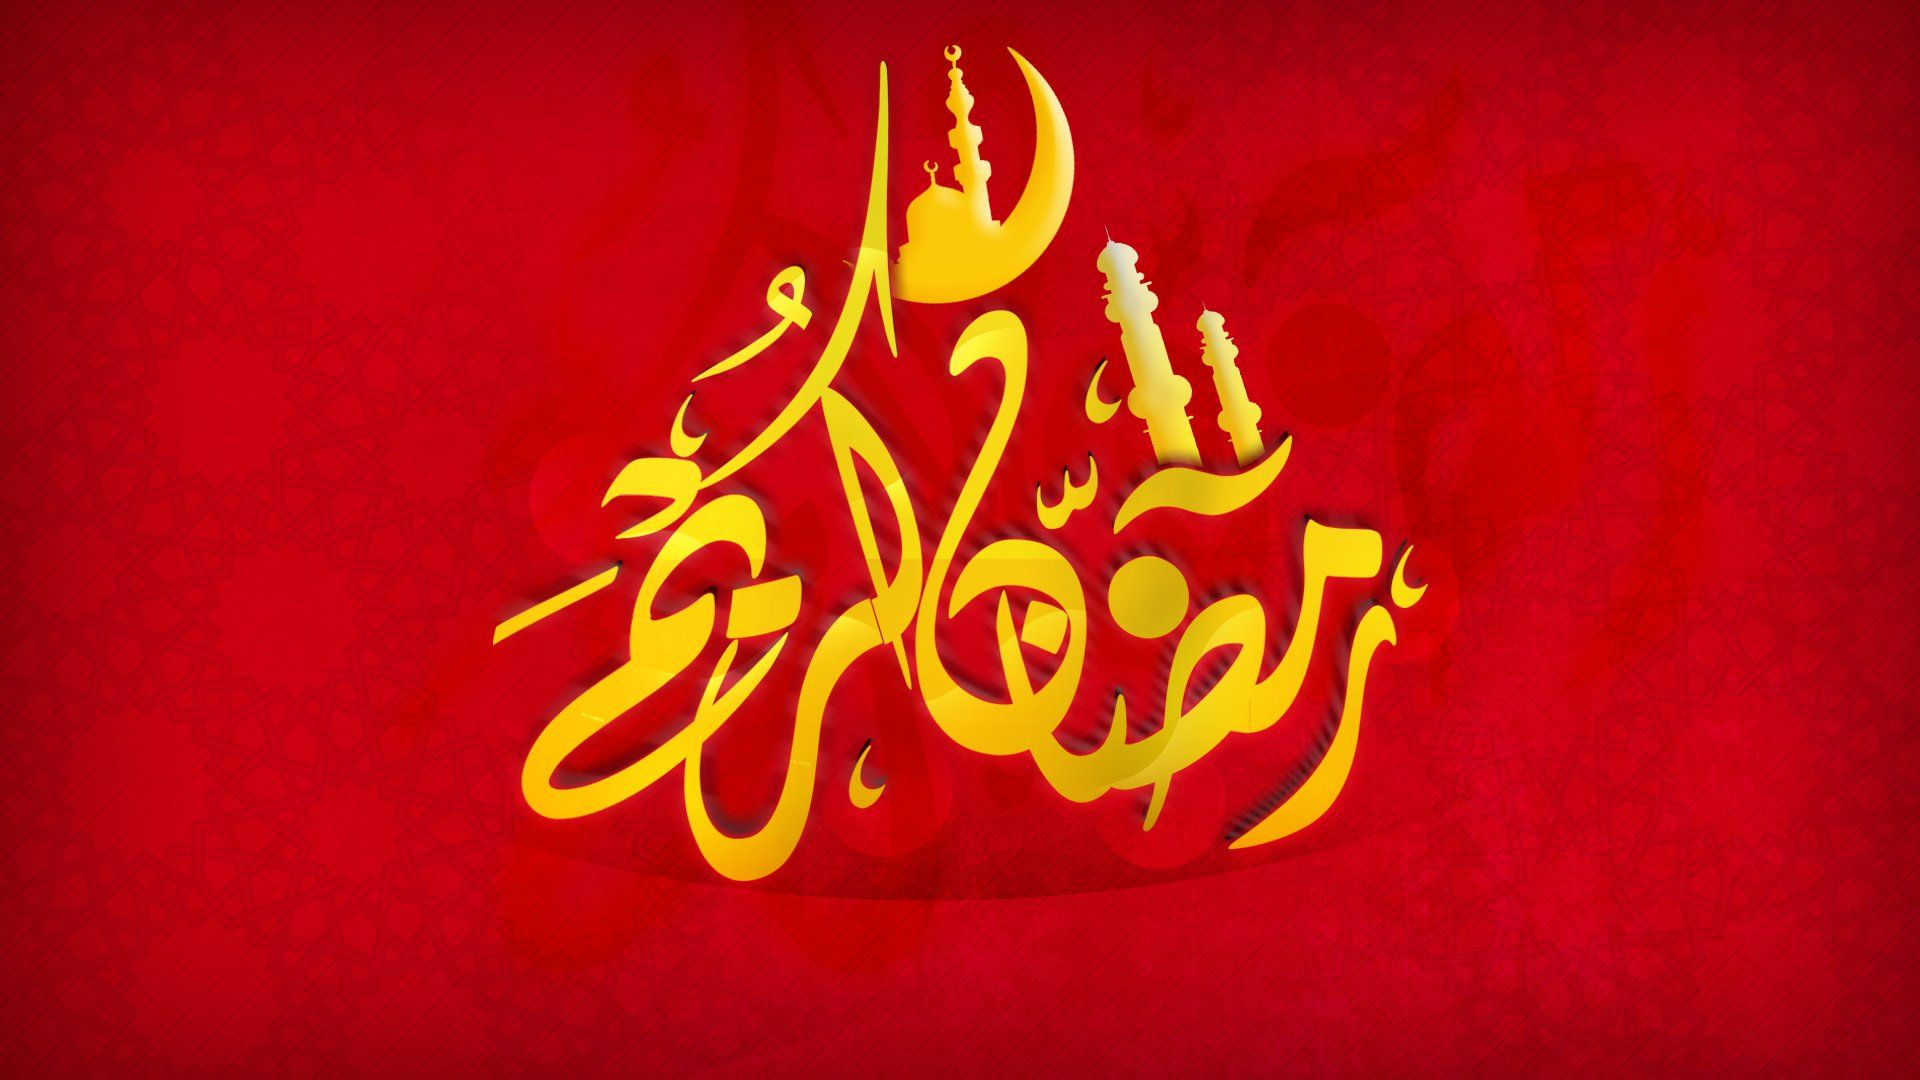 Download Hd Ramadeen Kareem Islamic Wallpapers For Your Desktop